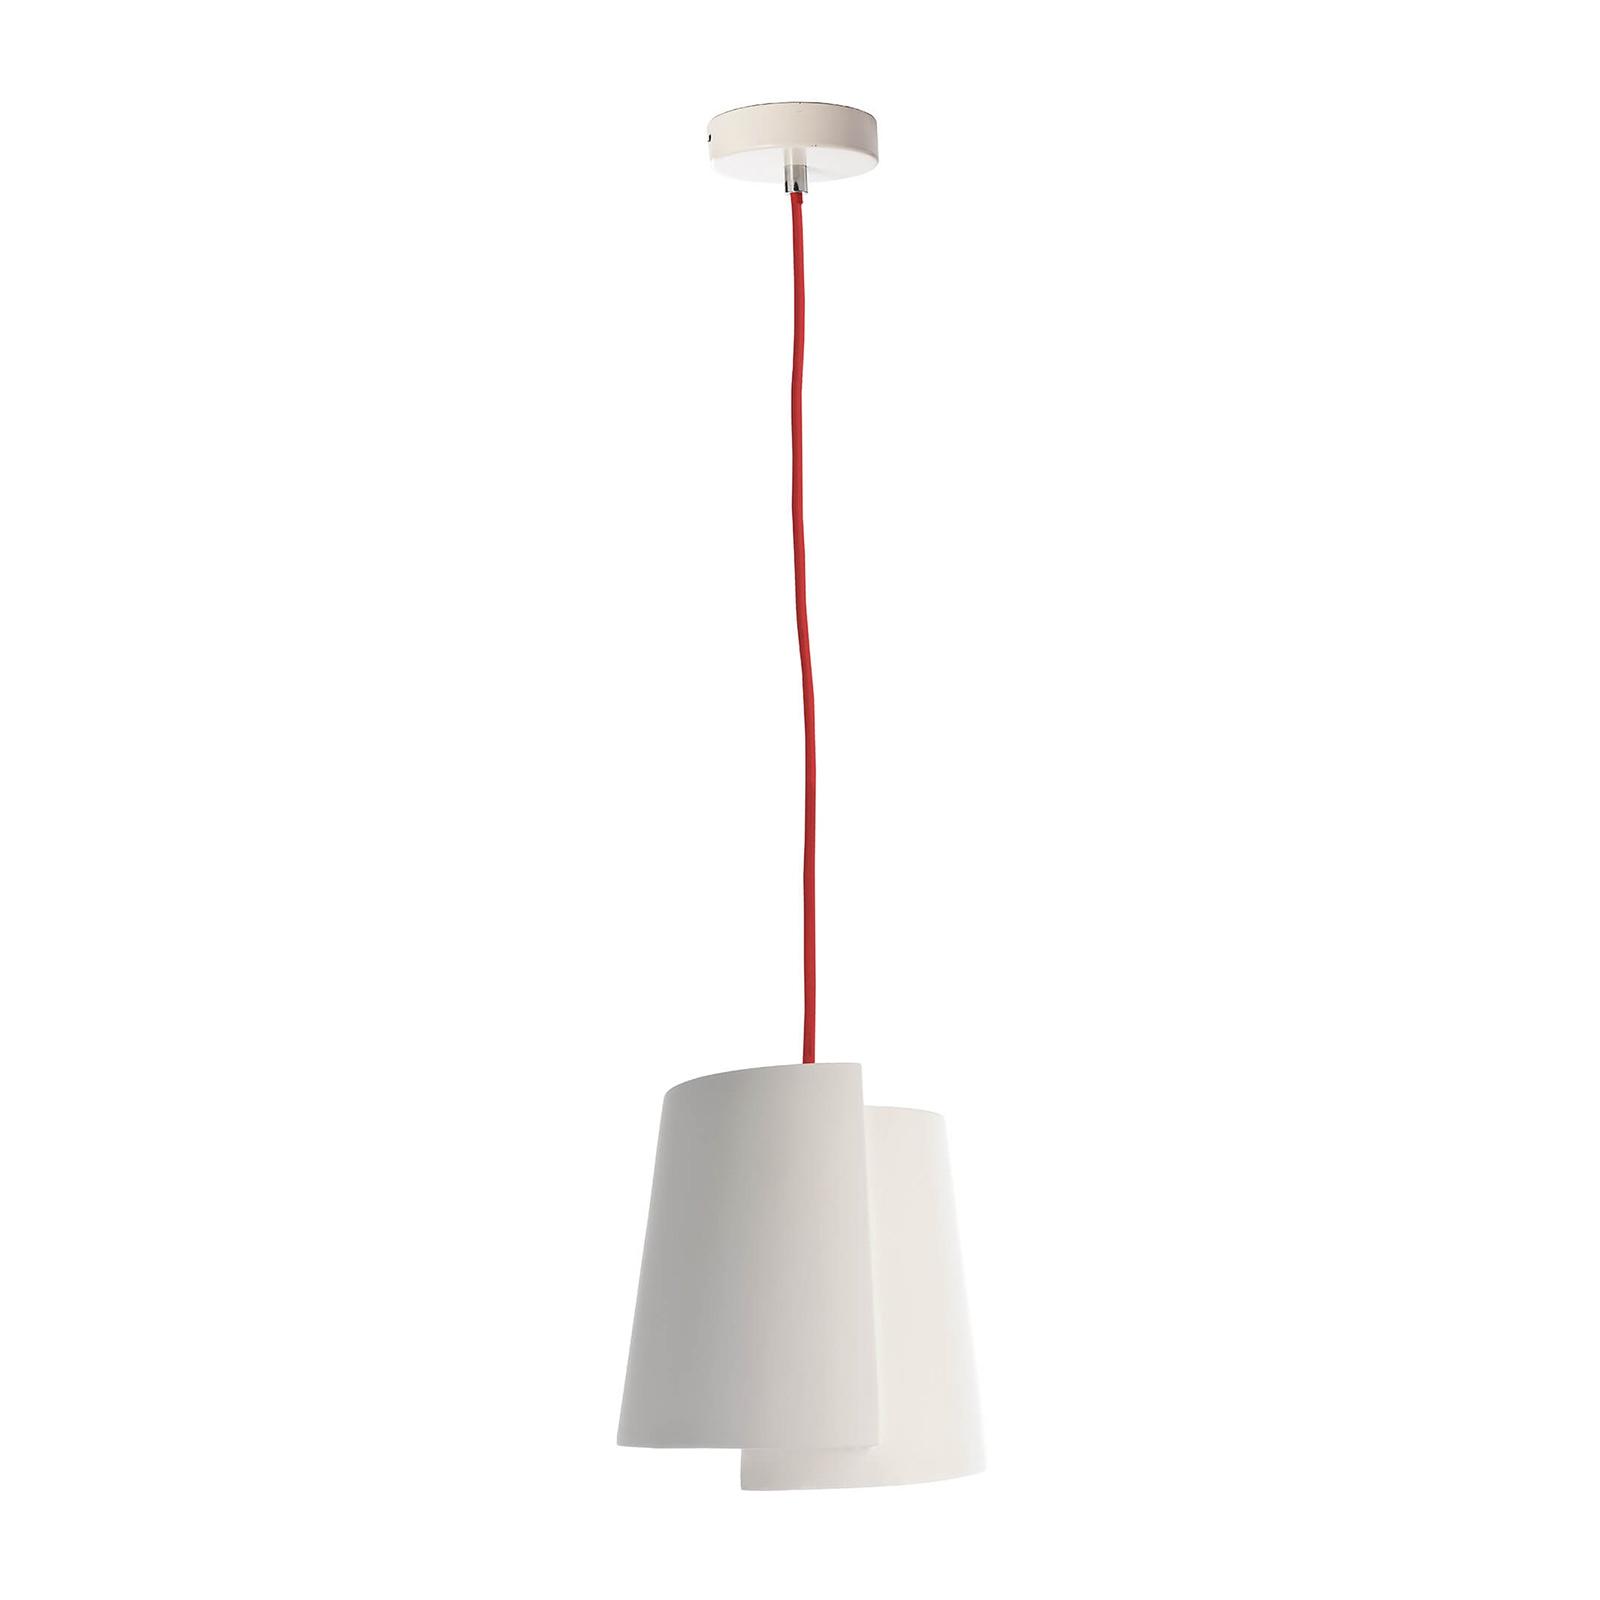 Hanglamp Twister I, wit, Ø 18 cm